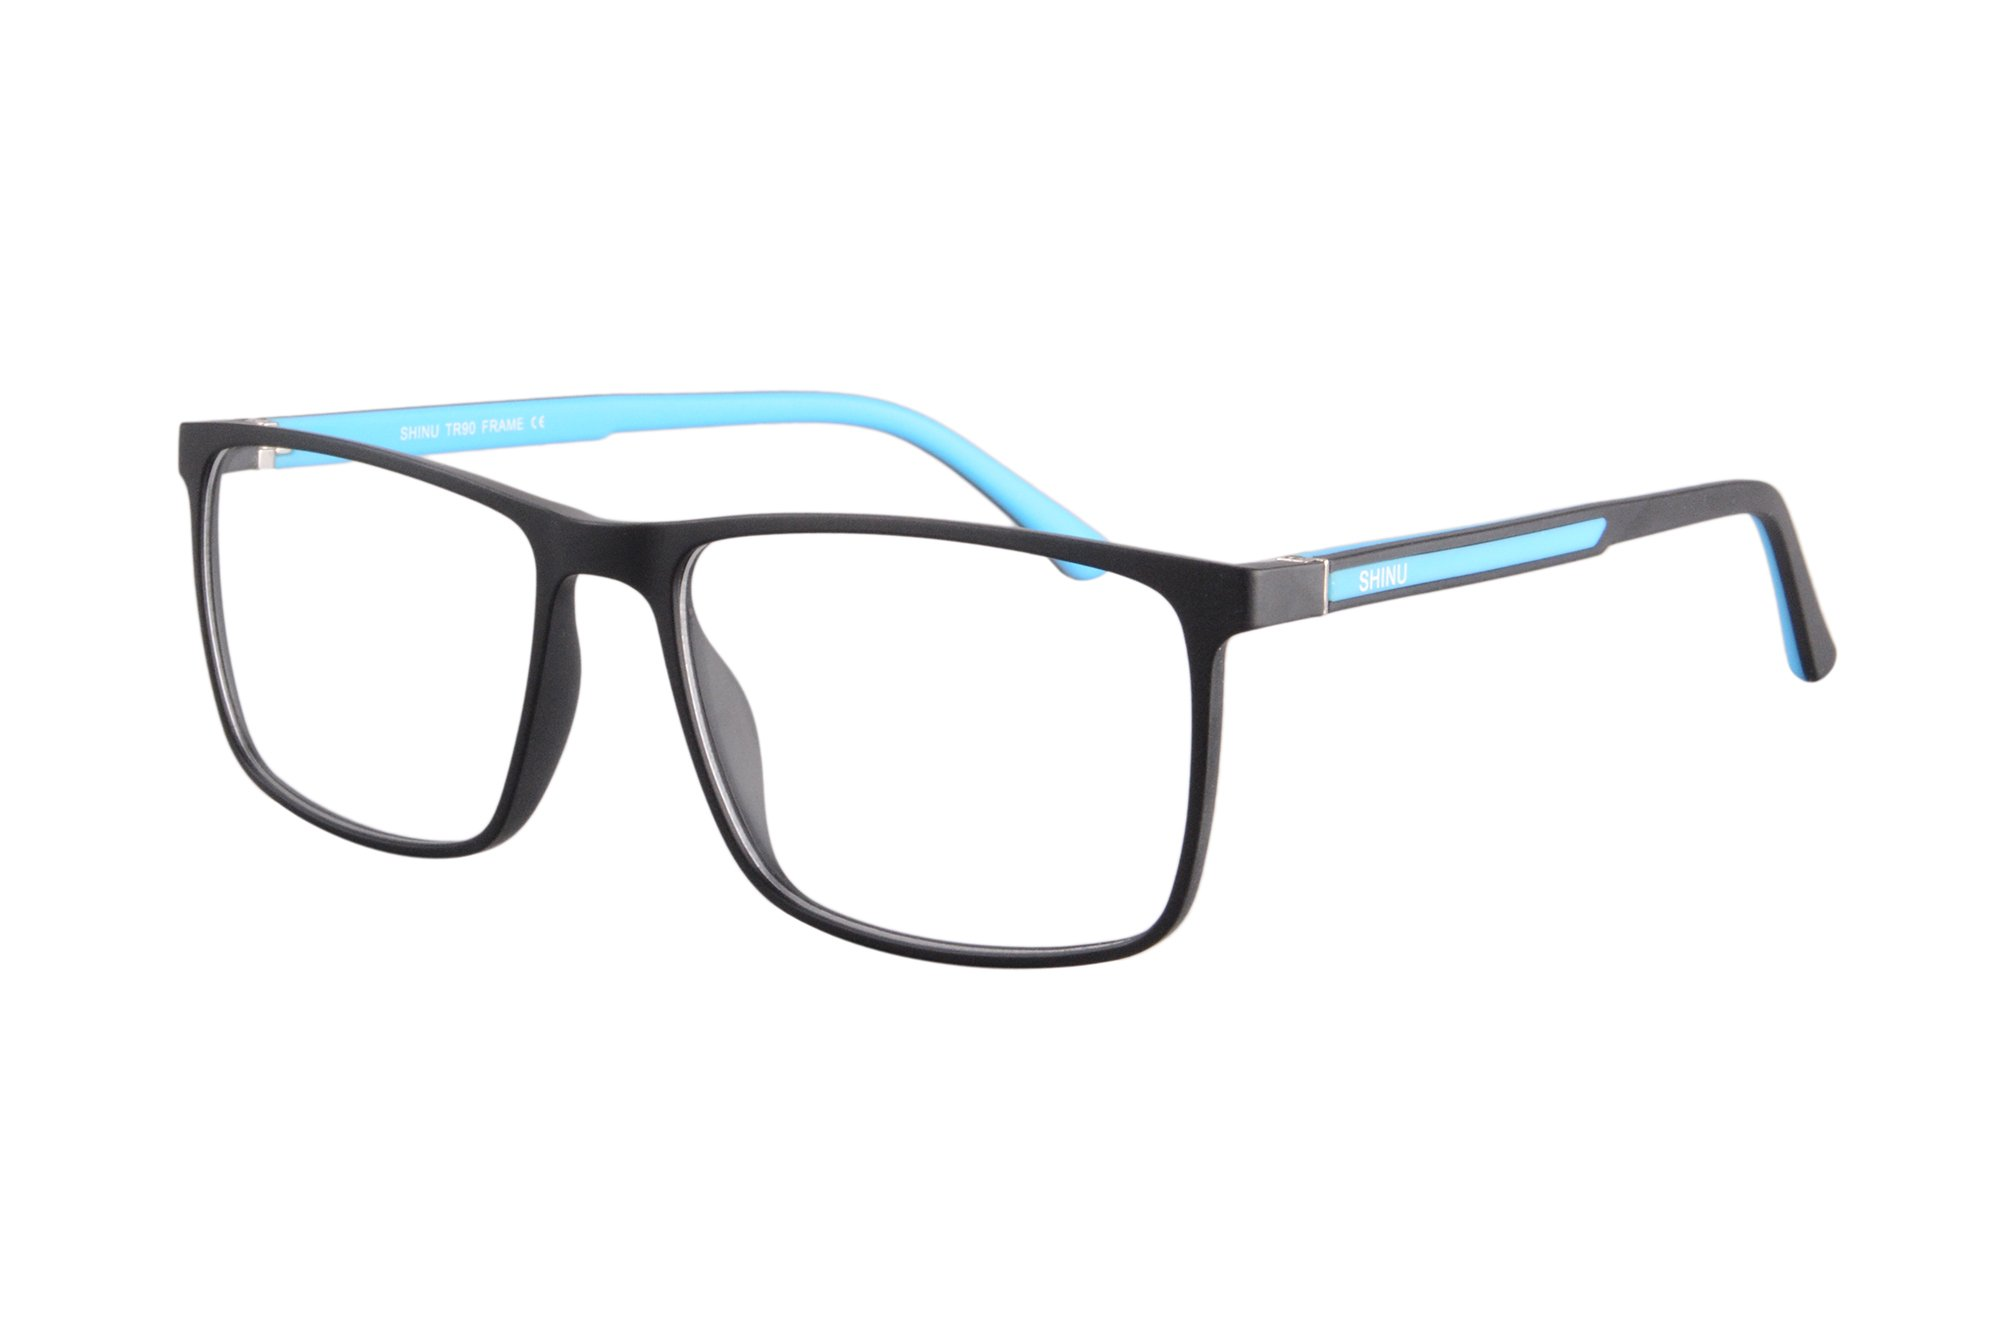 SHINU Anti Blue Light Transition Lens Glasses Photochromic Sunglasses with Prescription Myopia Glasses and Reading Glasses-SH077